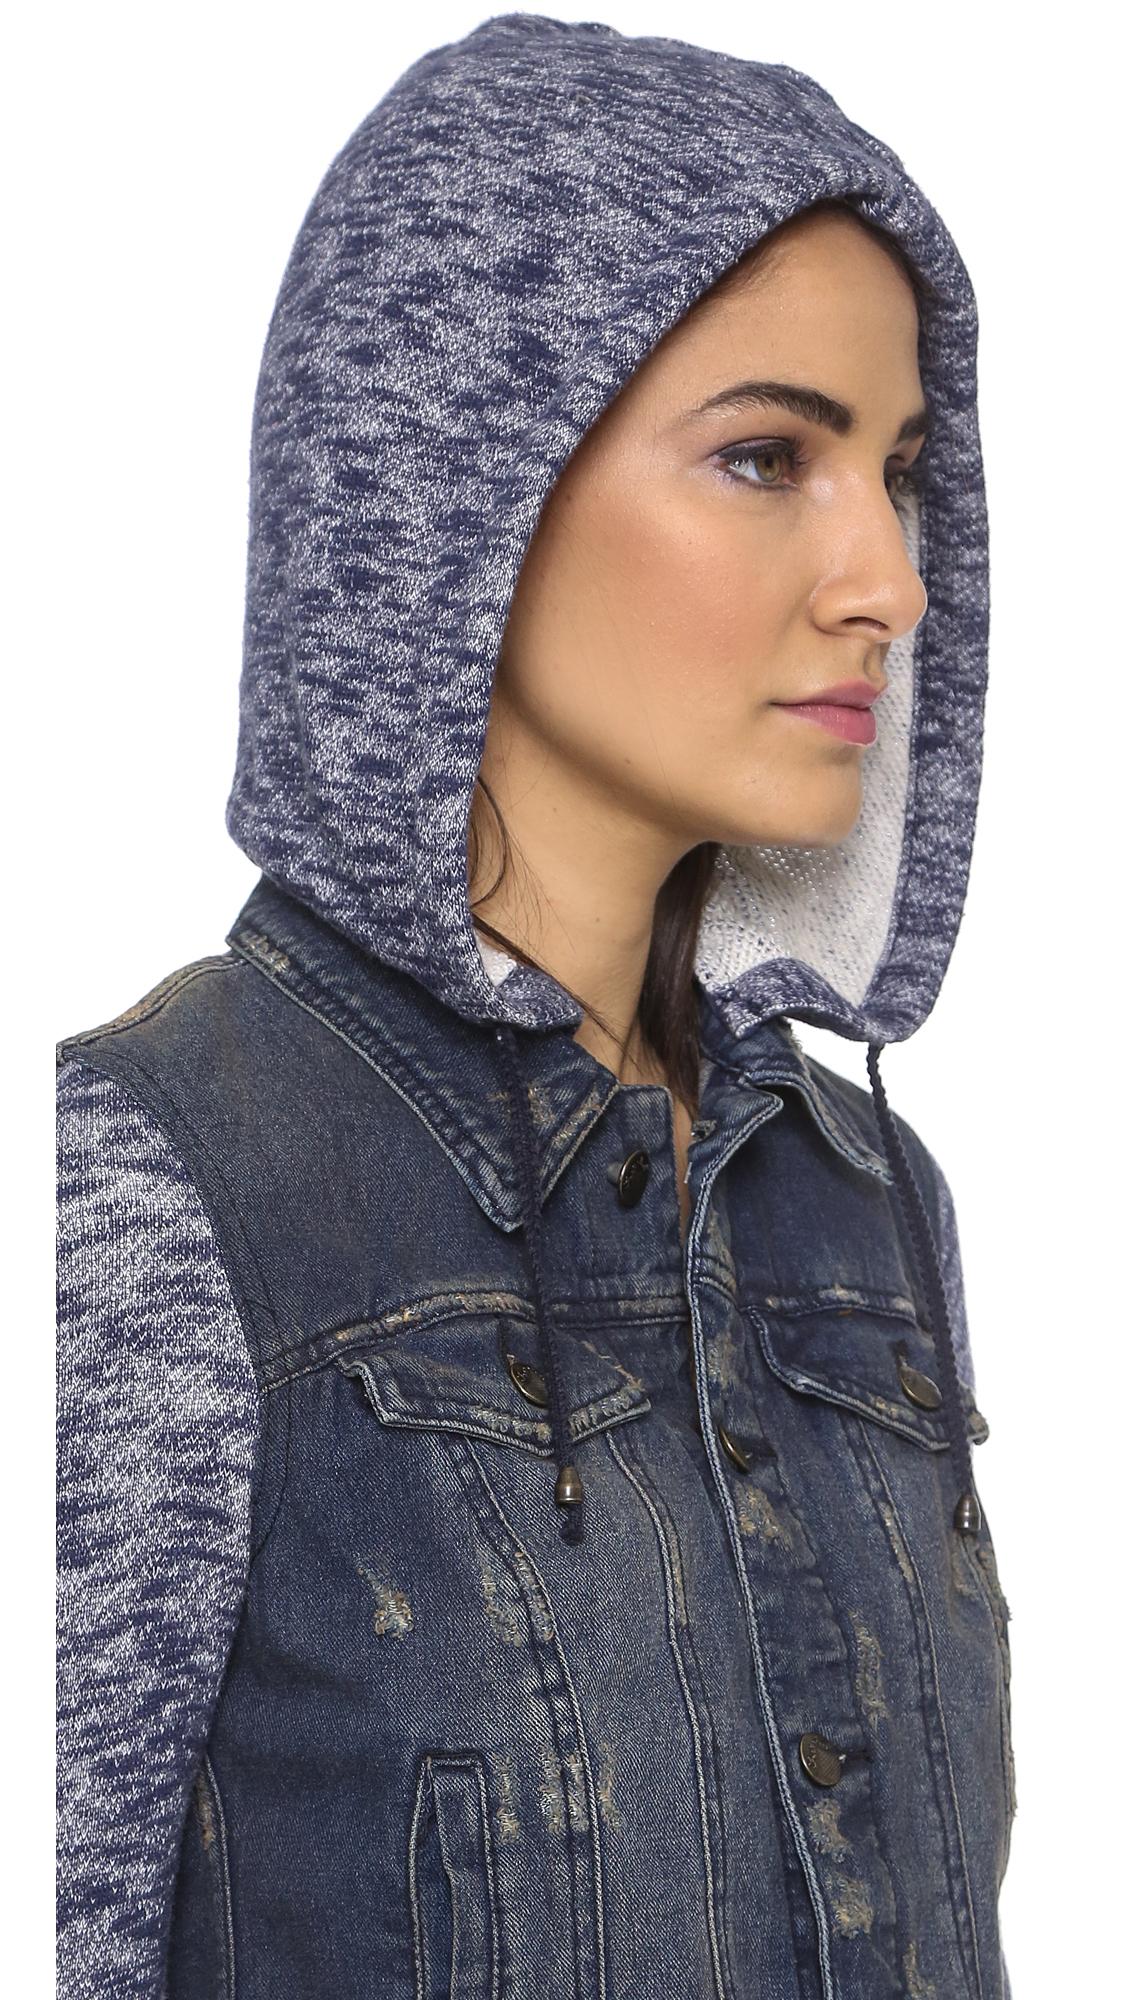 Denim Jacket Knitting Pattern : Free people Denim Knit Jacket - Indigo Rinse in Blue Lyst